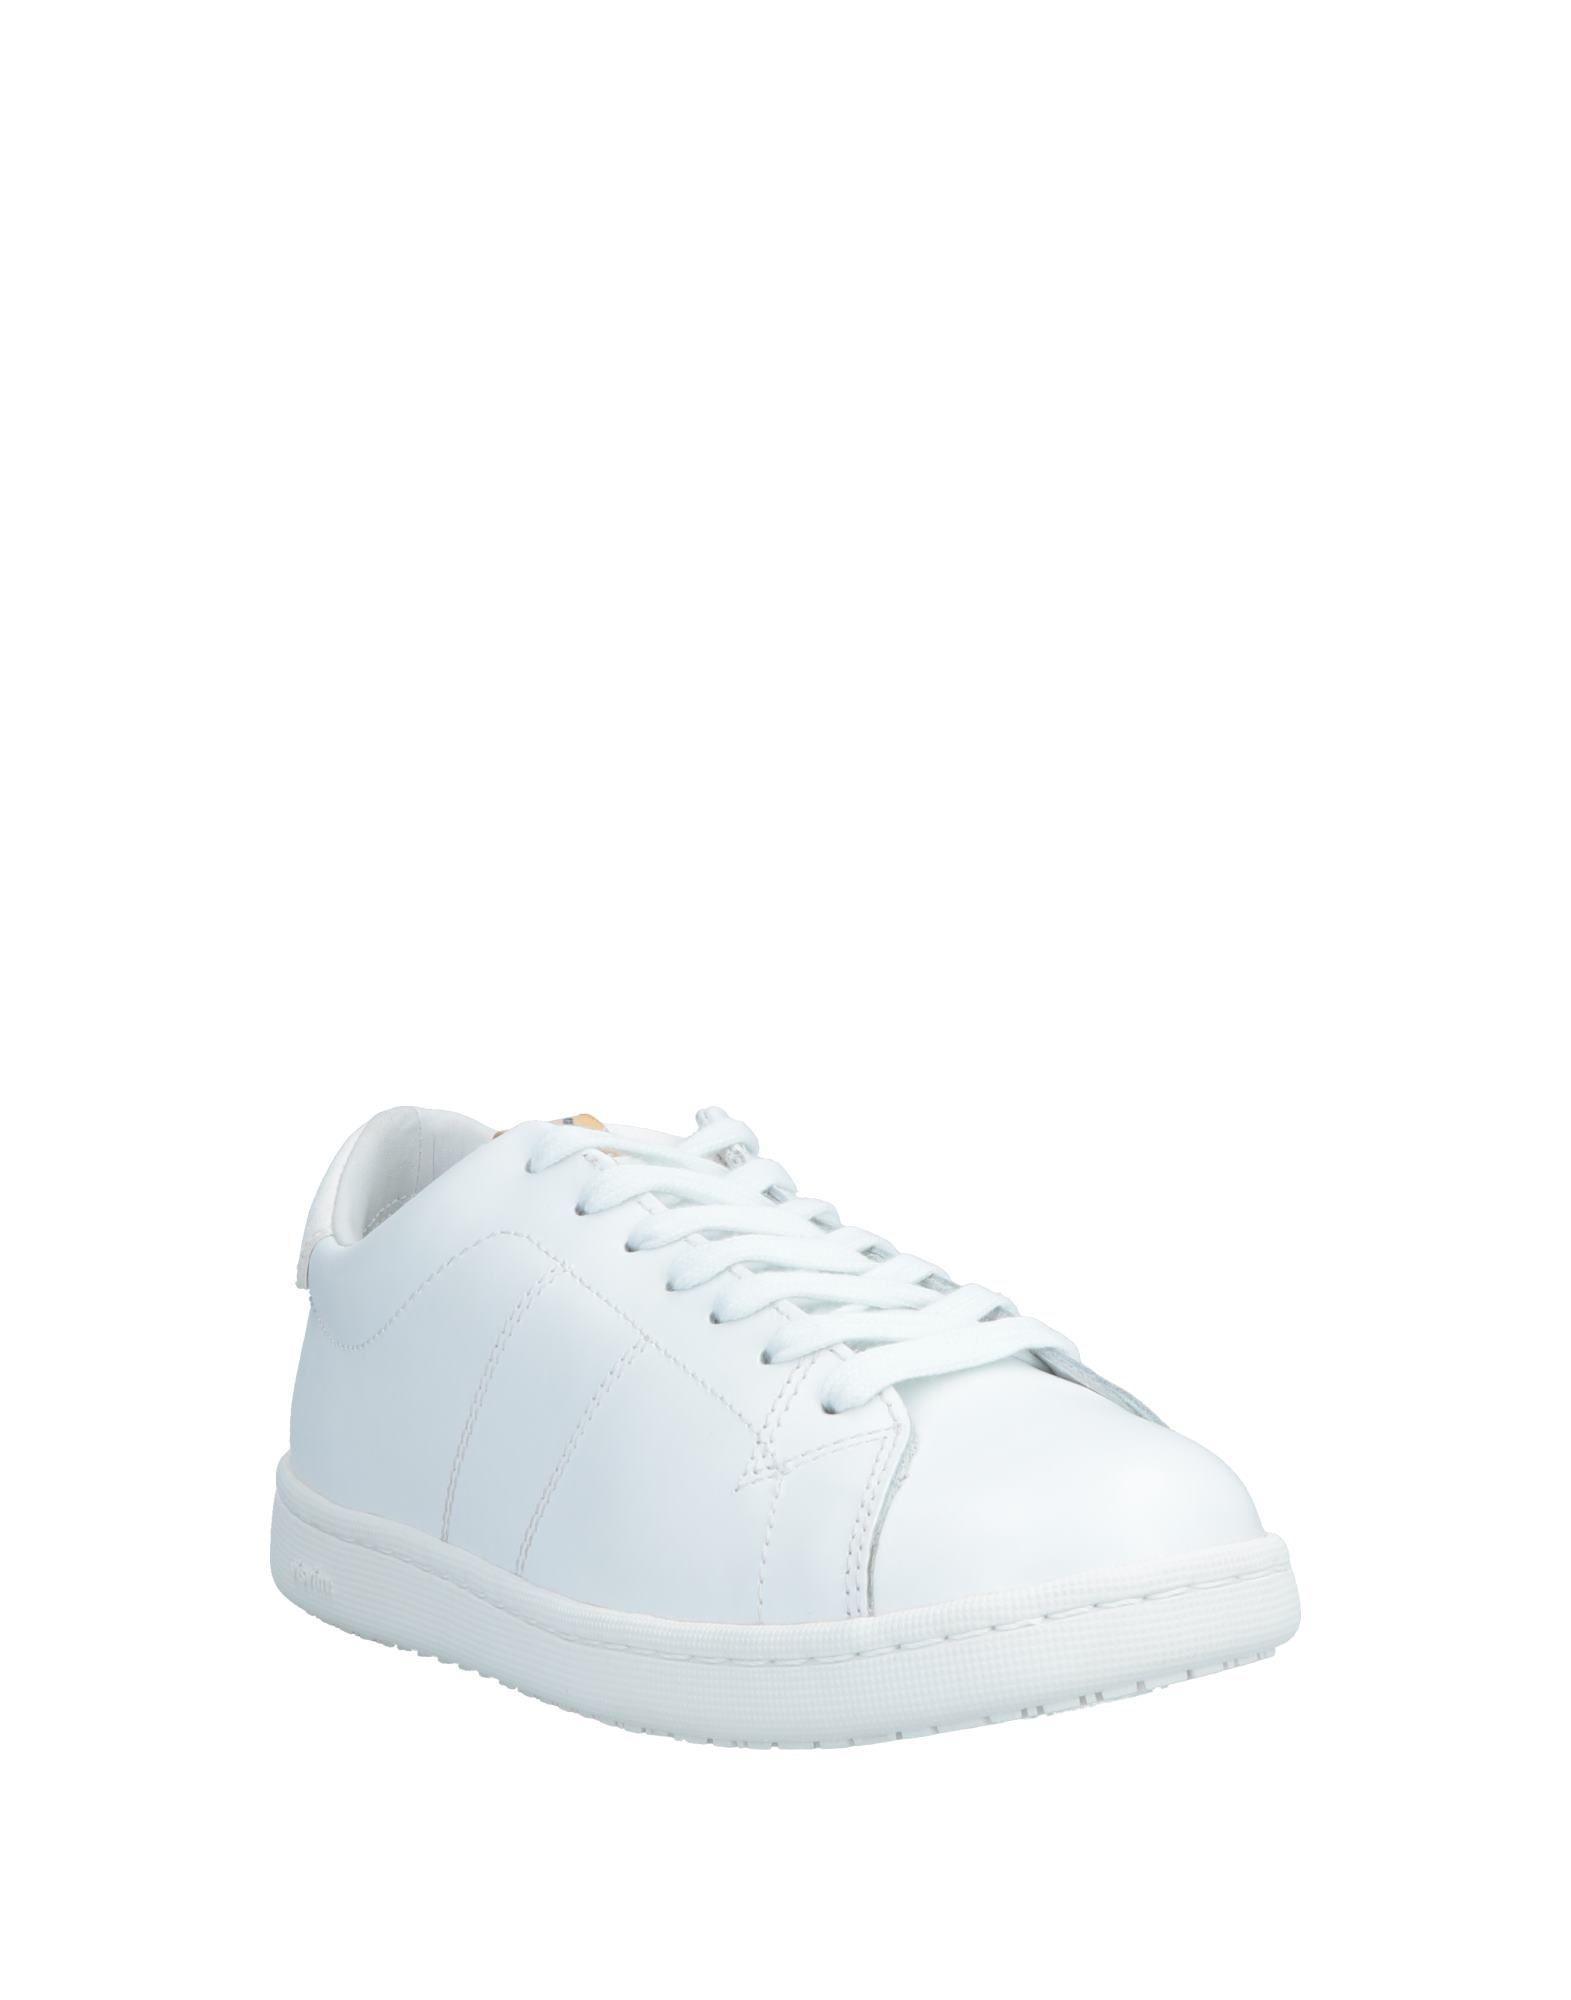 Sneakers & Tennis basses Cuir Visvim pour homme en coloris Blanc tFgX